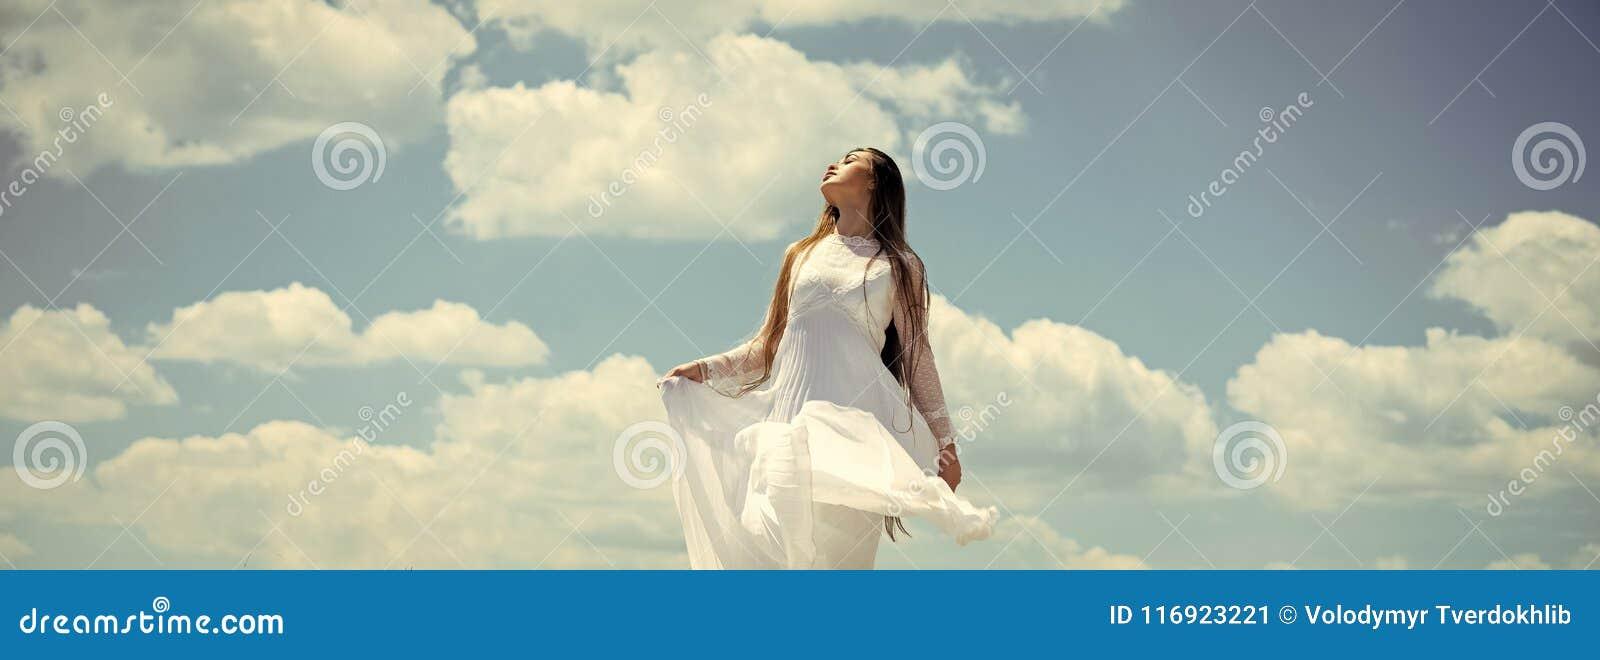 f679af198bbc Girl Enjoy Sunny Summer Day On Cloudy Blue Sky Stock Image - Image ...